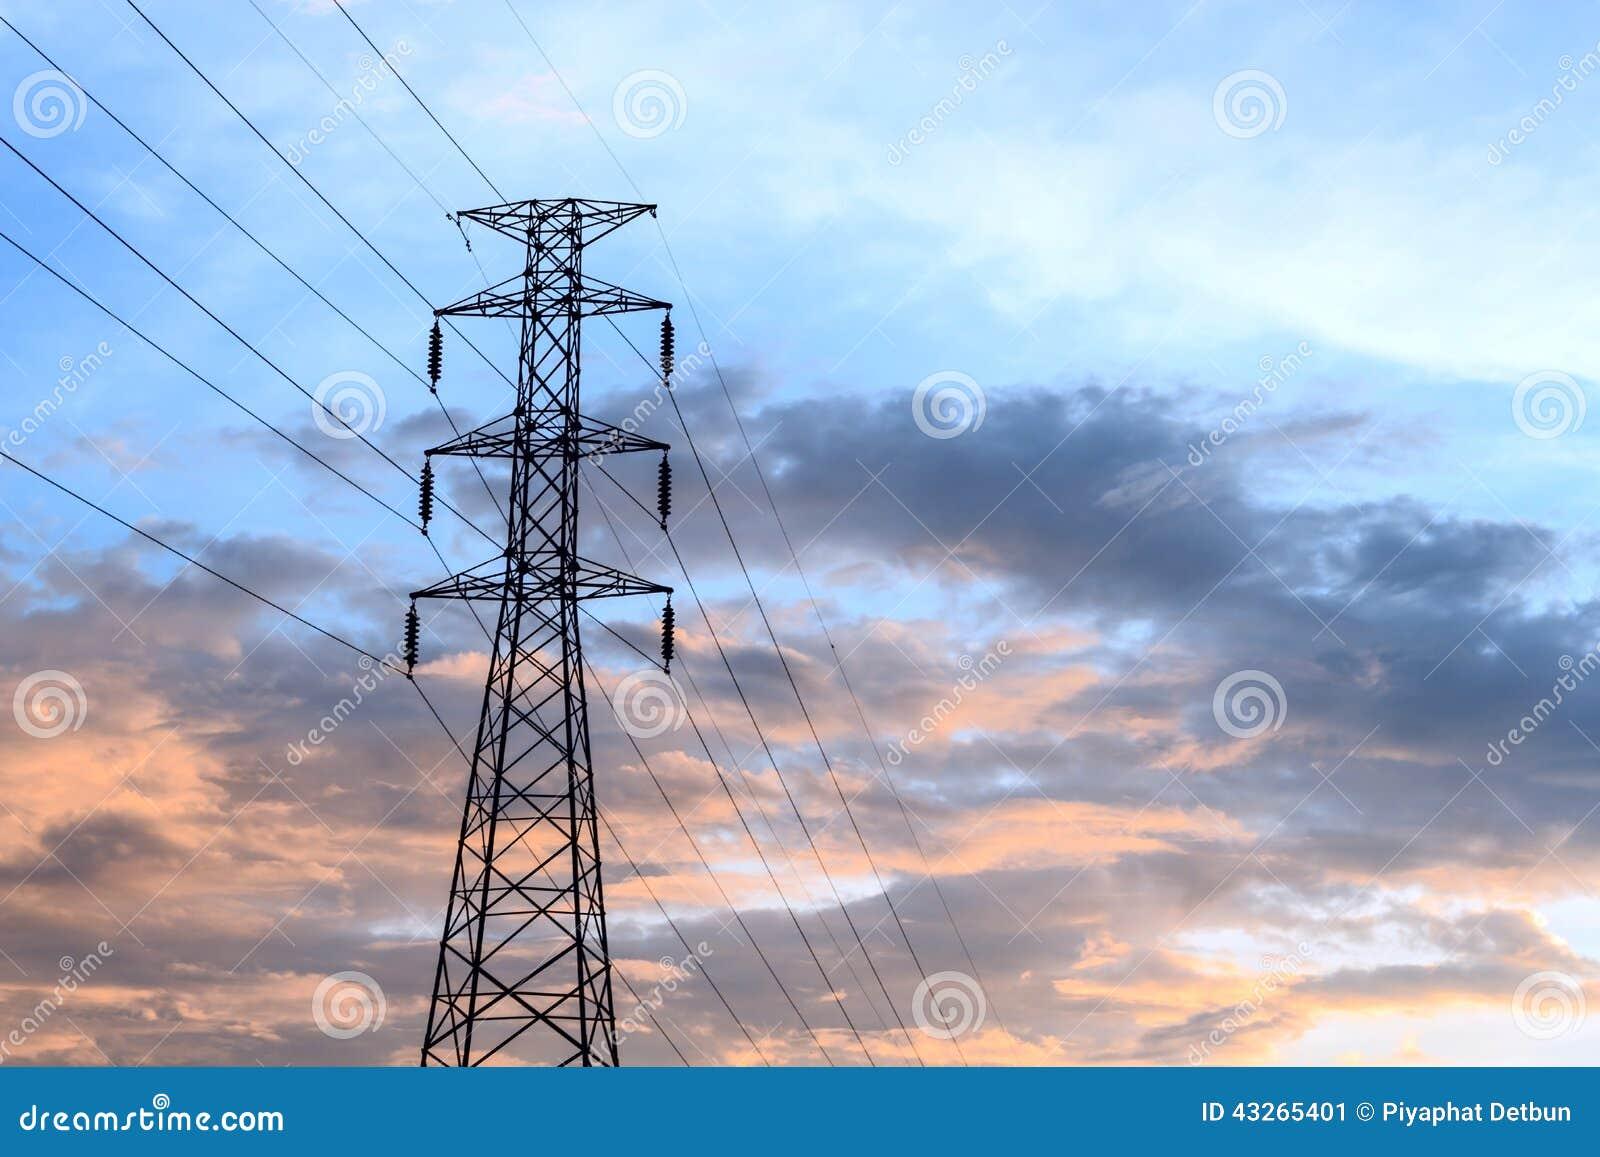 High Voltage Power Lines : High voltage power lines stock photo image